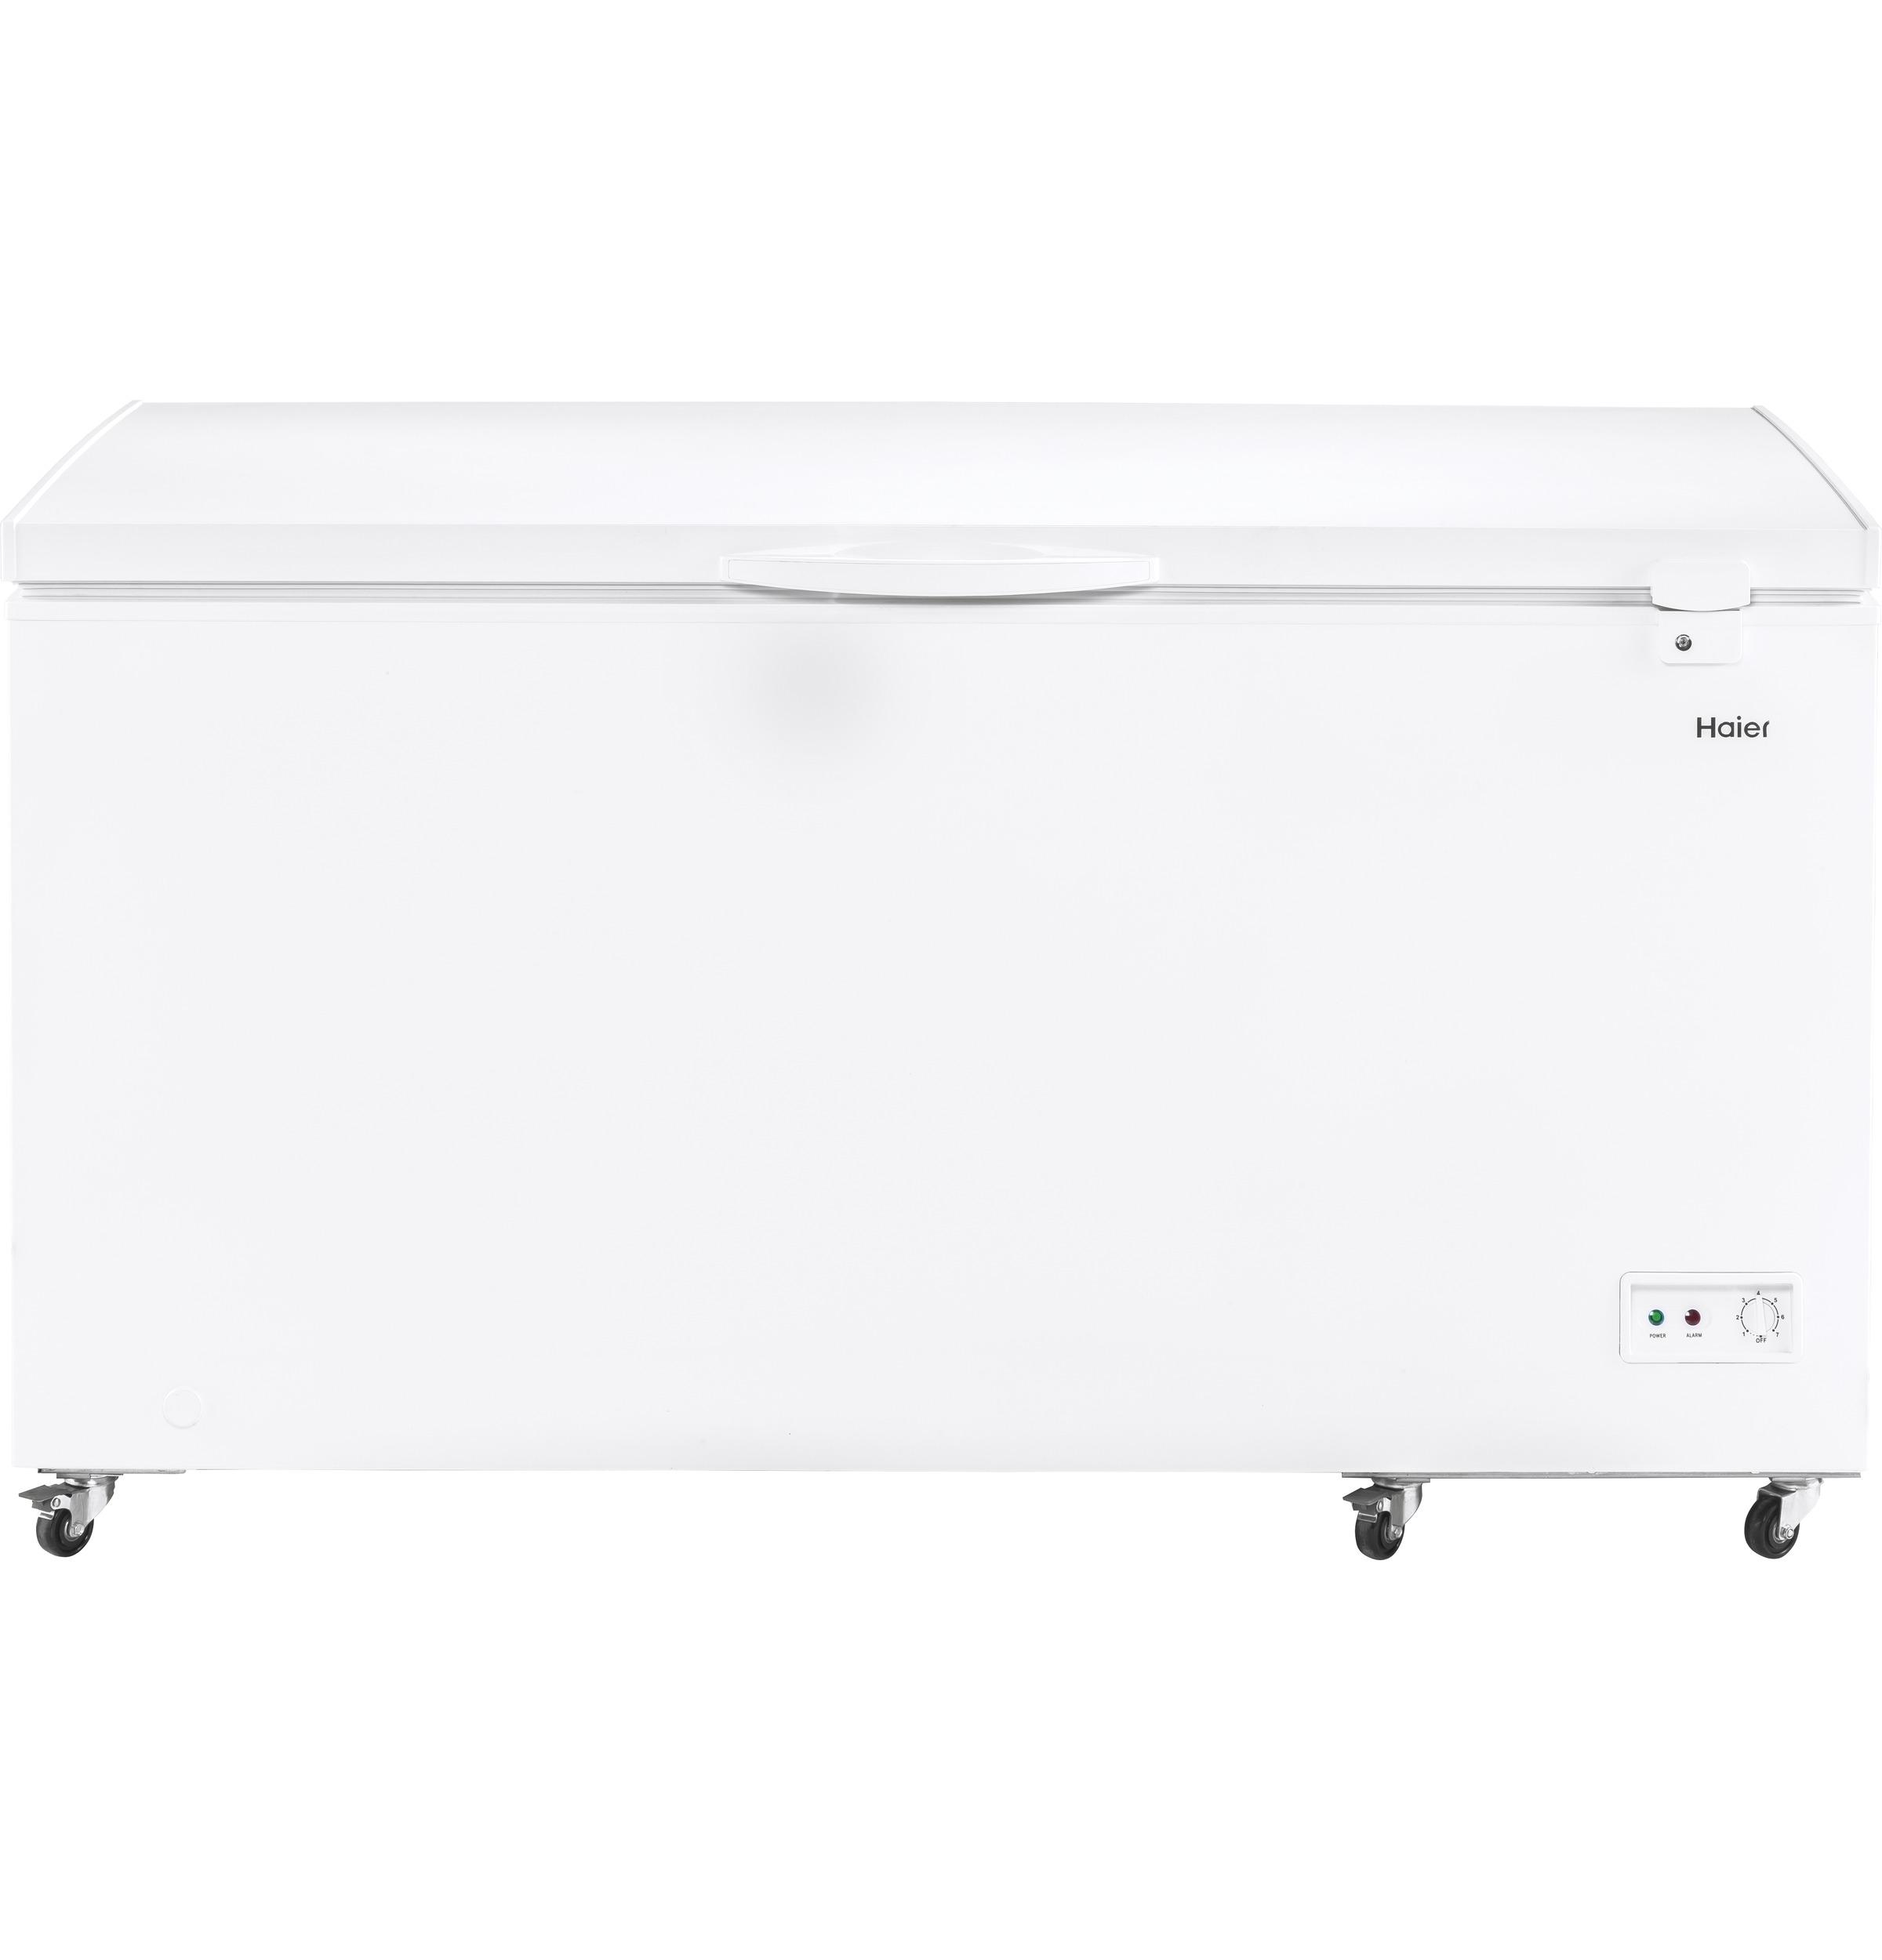 14.5 Cu. Ft. Chest Freezer